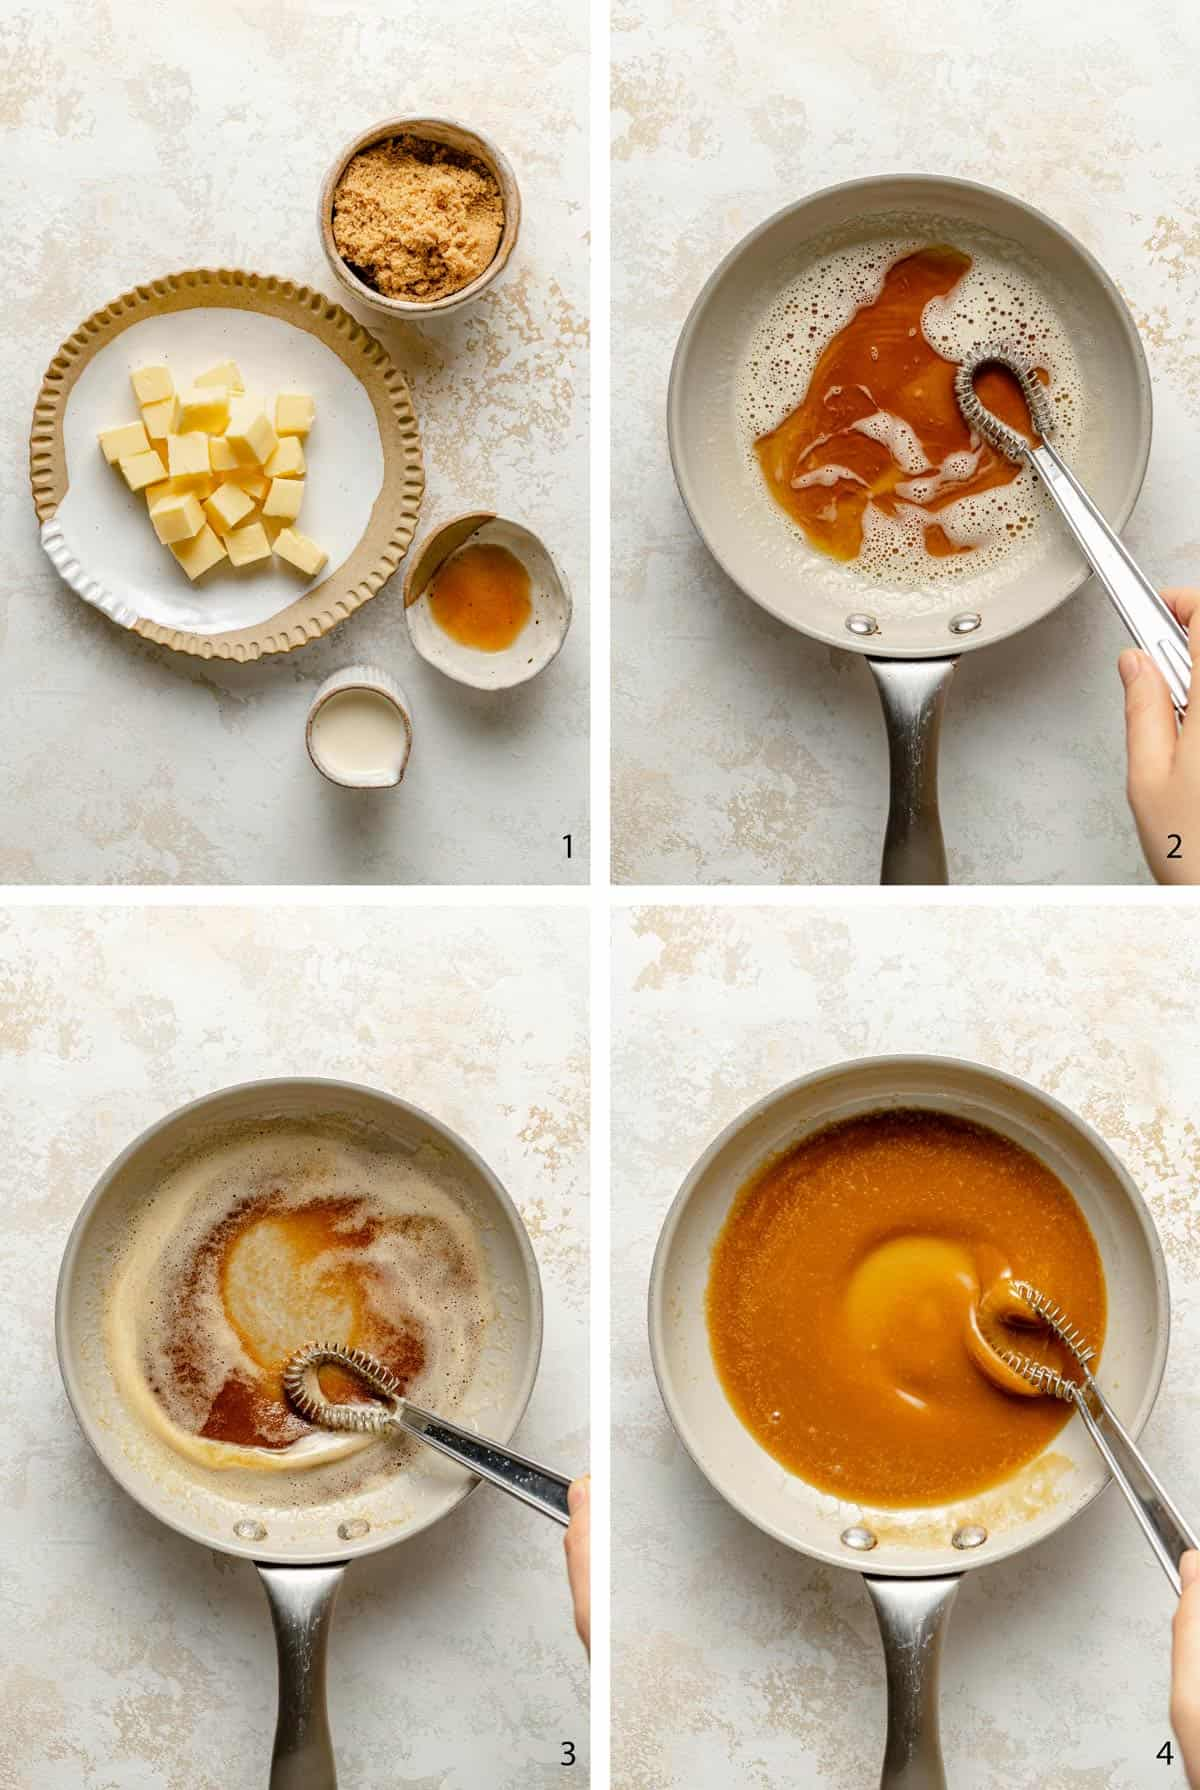 process steps of making brown butter caramel